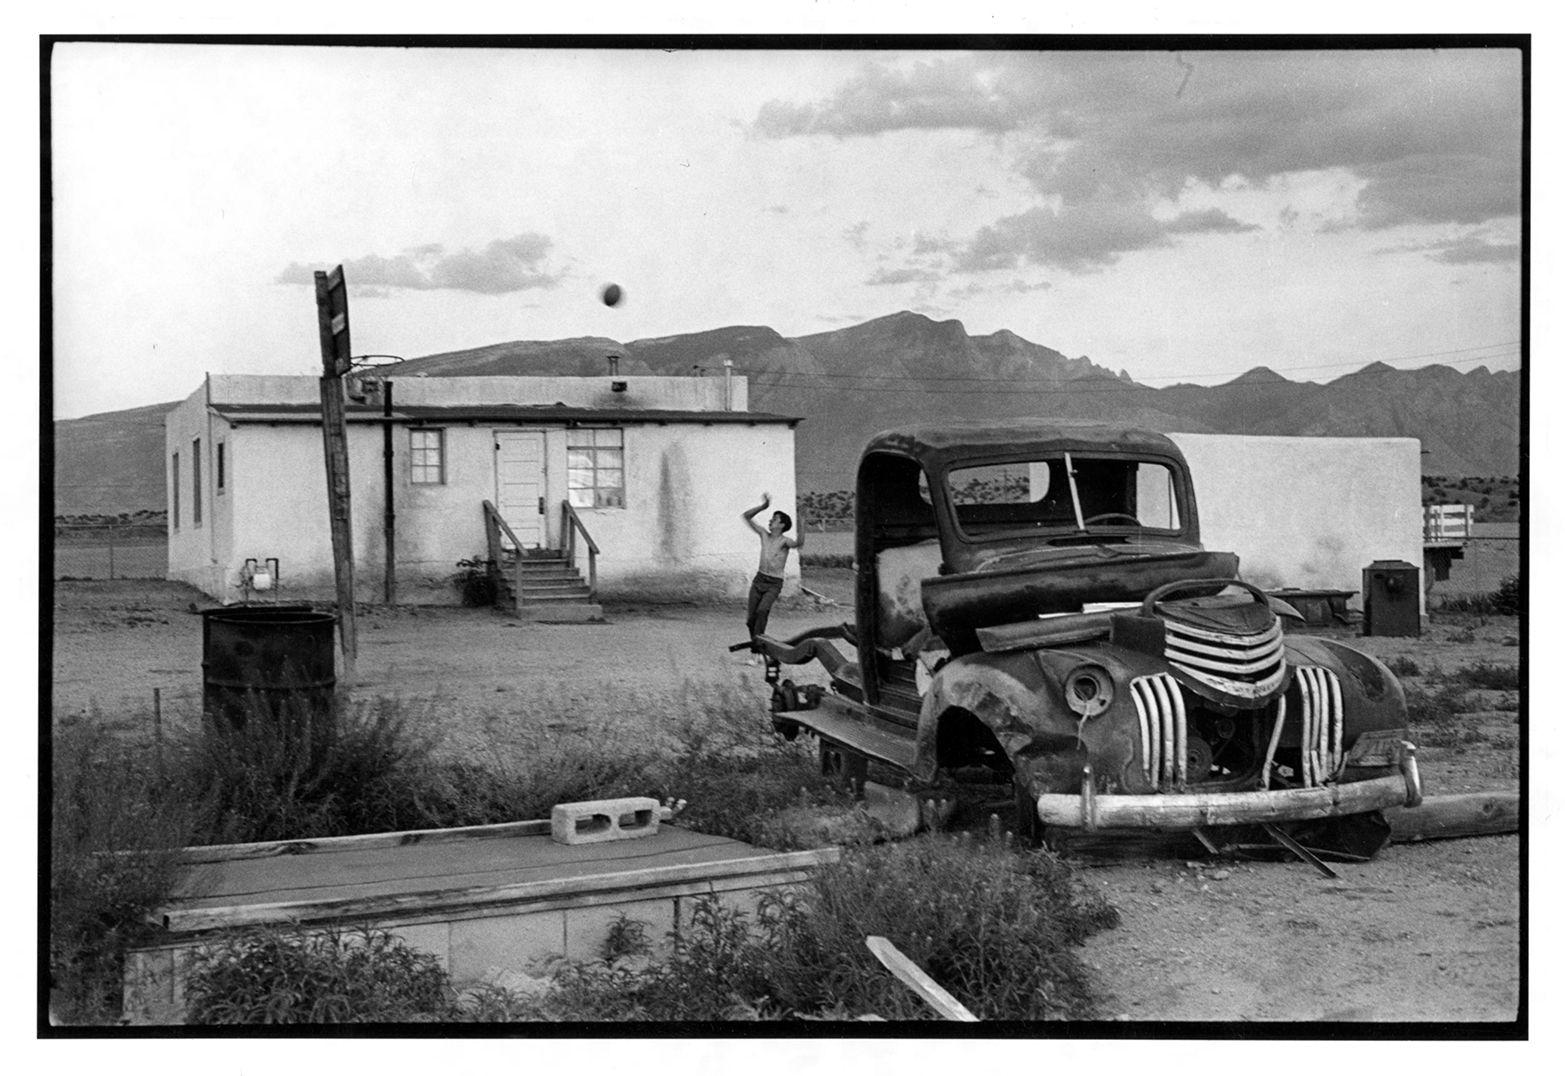 Copyright Danny Lyon / Magnum Photos, Llanito, New Mexico, 1970